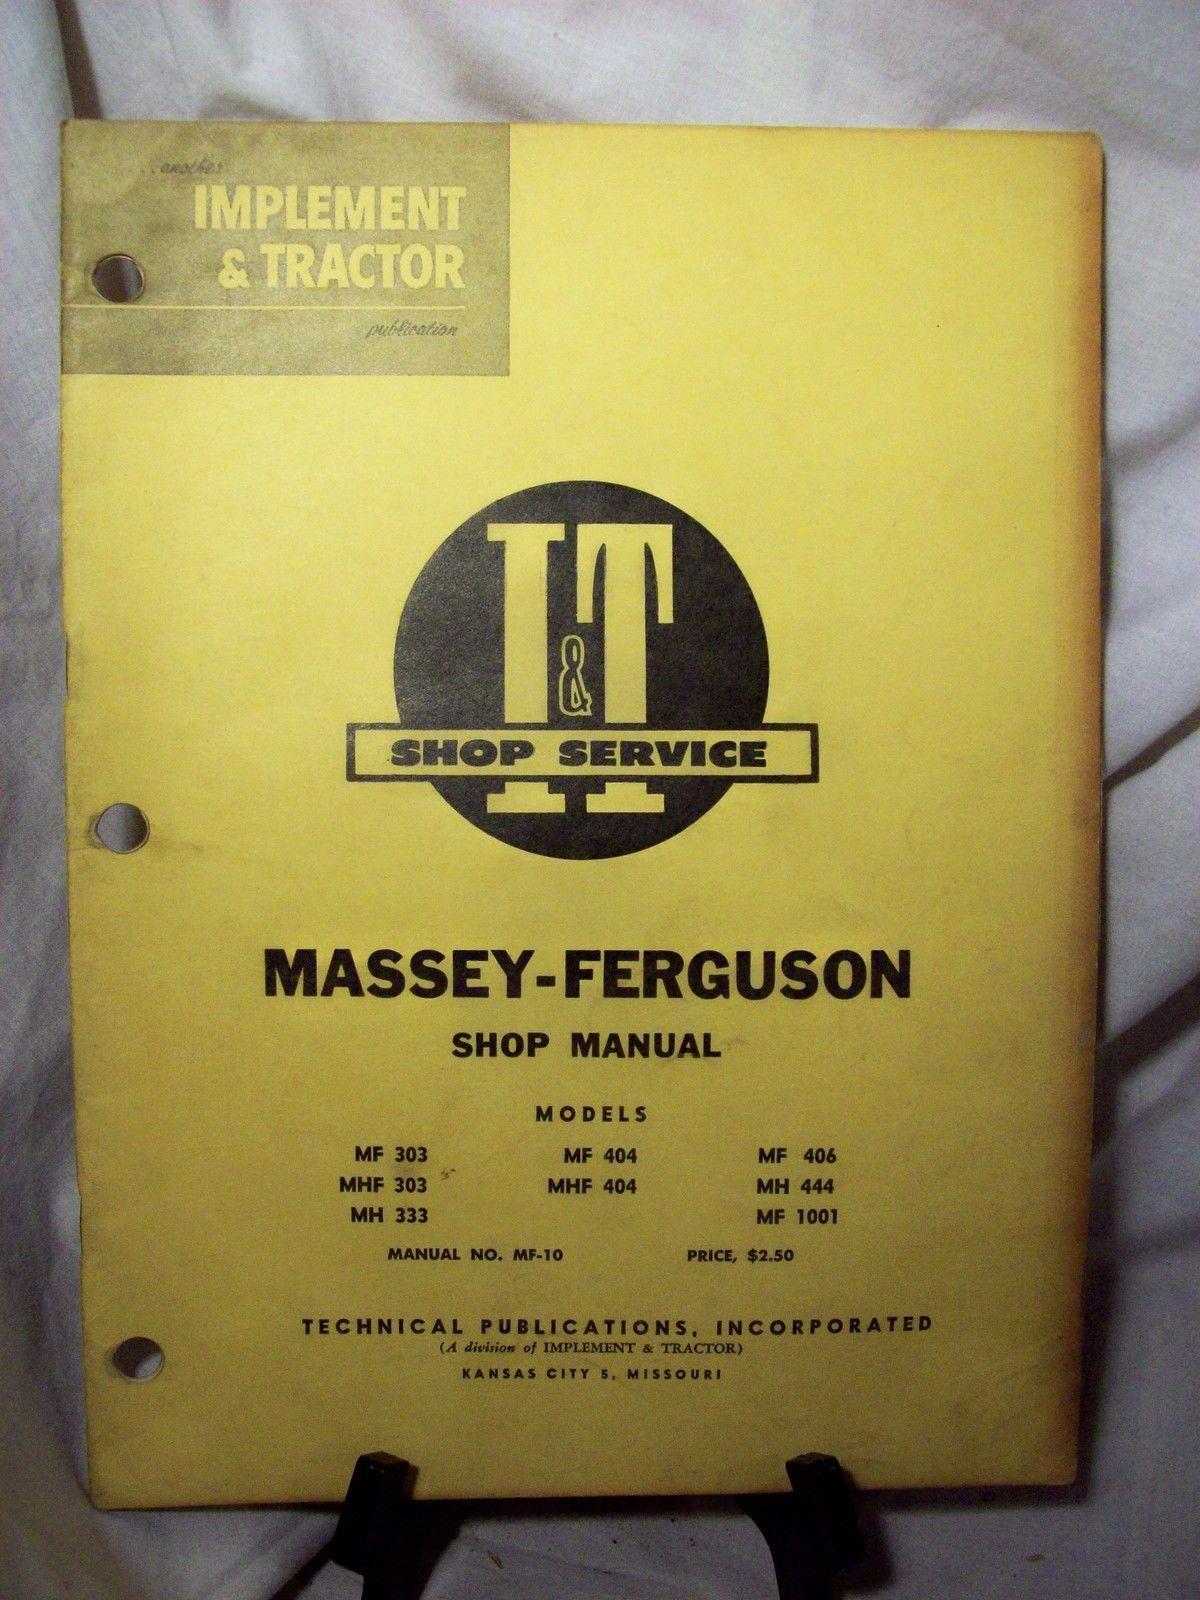 I & T Shop Service Massey-Ferguson Manual and similar items